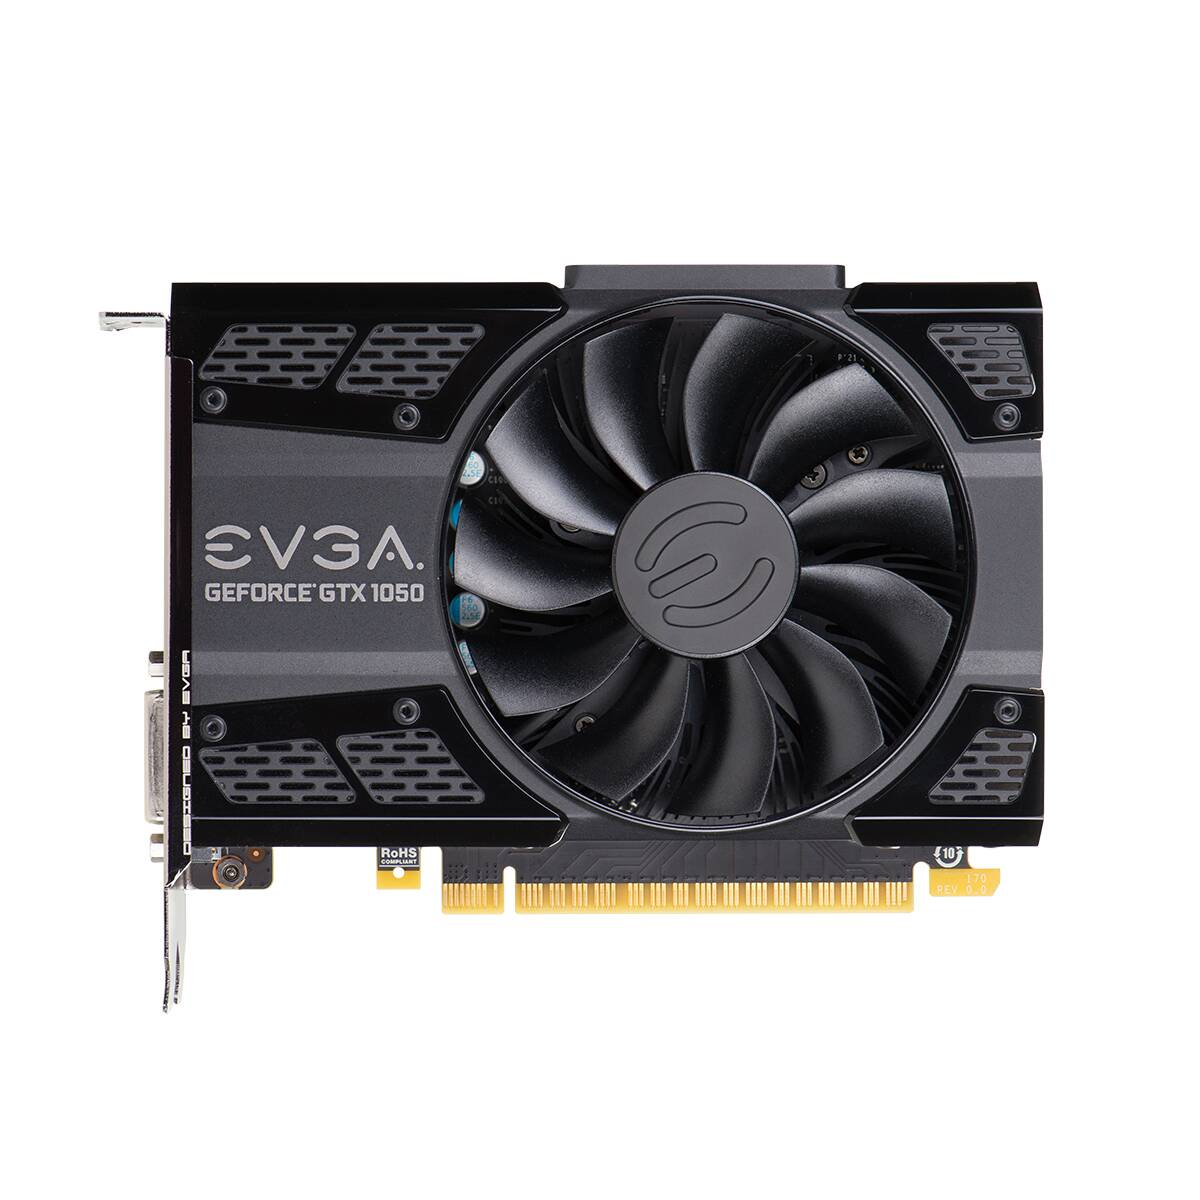 Placa de Video EVGA Nvidia Geforce GTX 1050 2GB 128BITS ACX DDR5 02G-P4-6150-KR